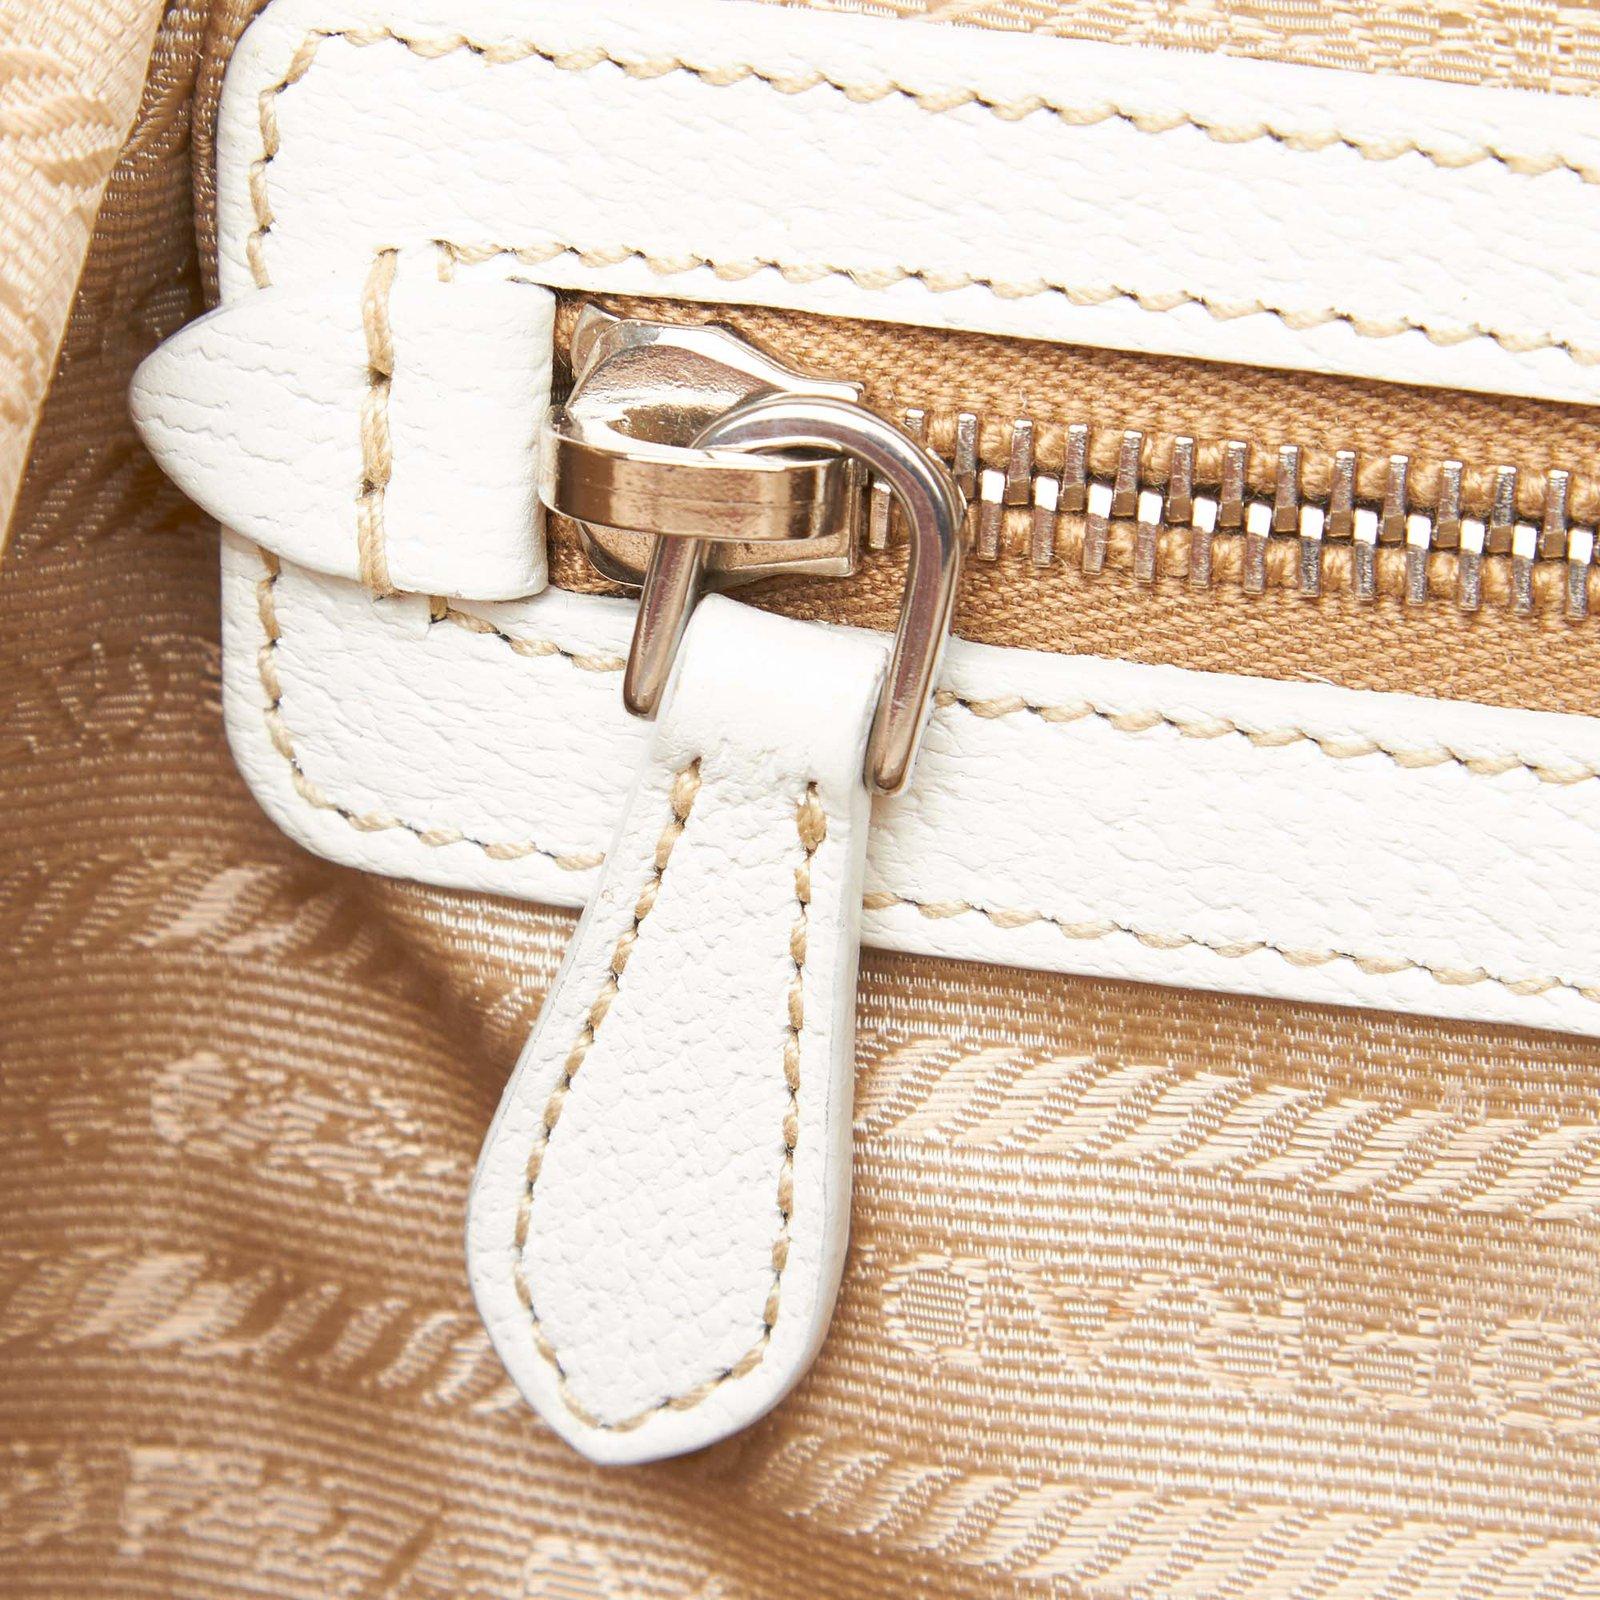 73e4b1e0ddbb Prada Coated Canvas Shoulder Bag Handbags Leather,Other,Cloth,Cloth  Brown,White,Beige,Cream ref.93149 - Joli Closet